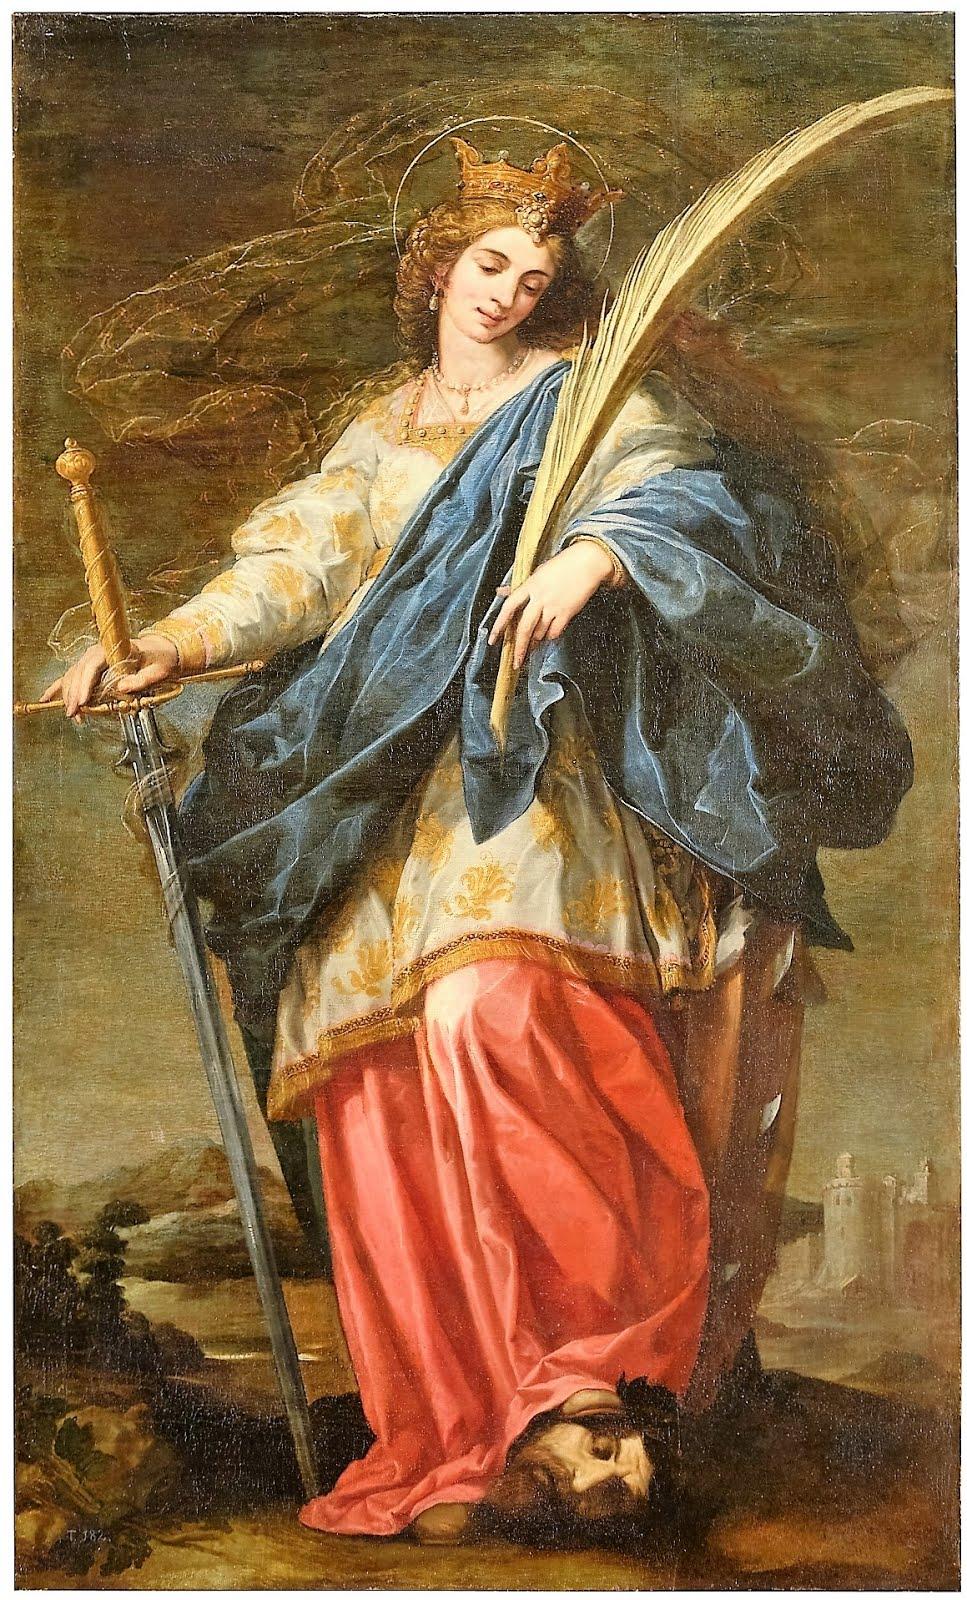 Saint Catherine of Alexandria, Part I -- An Introduction